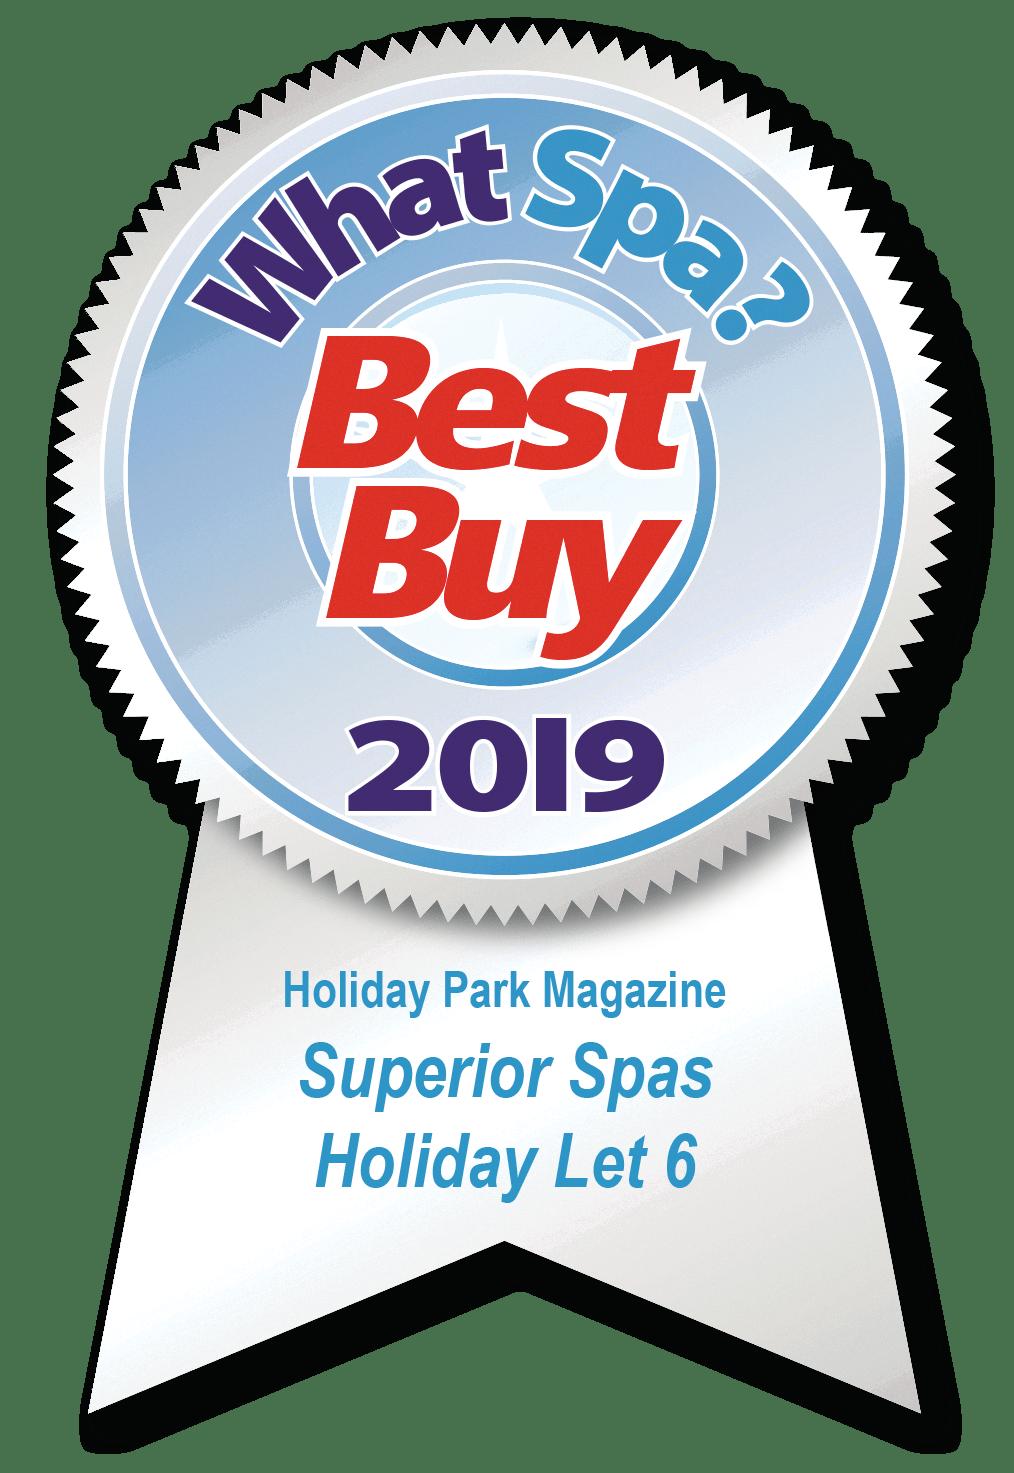 What Spa Award 2019 - Holiday Let 6